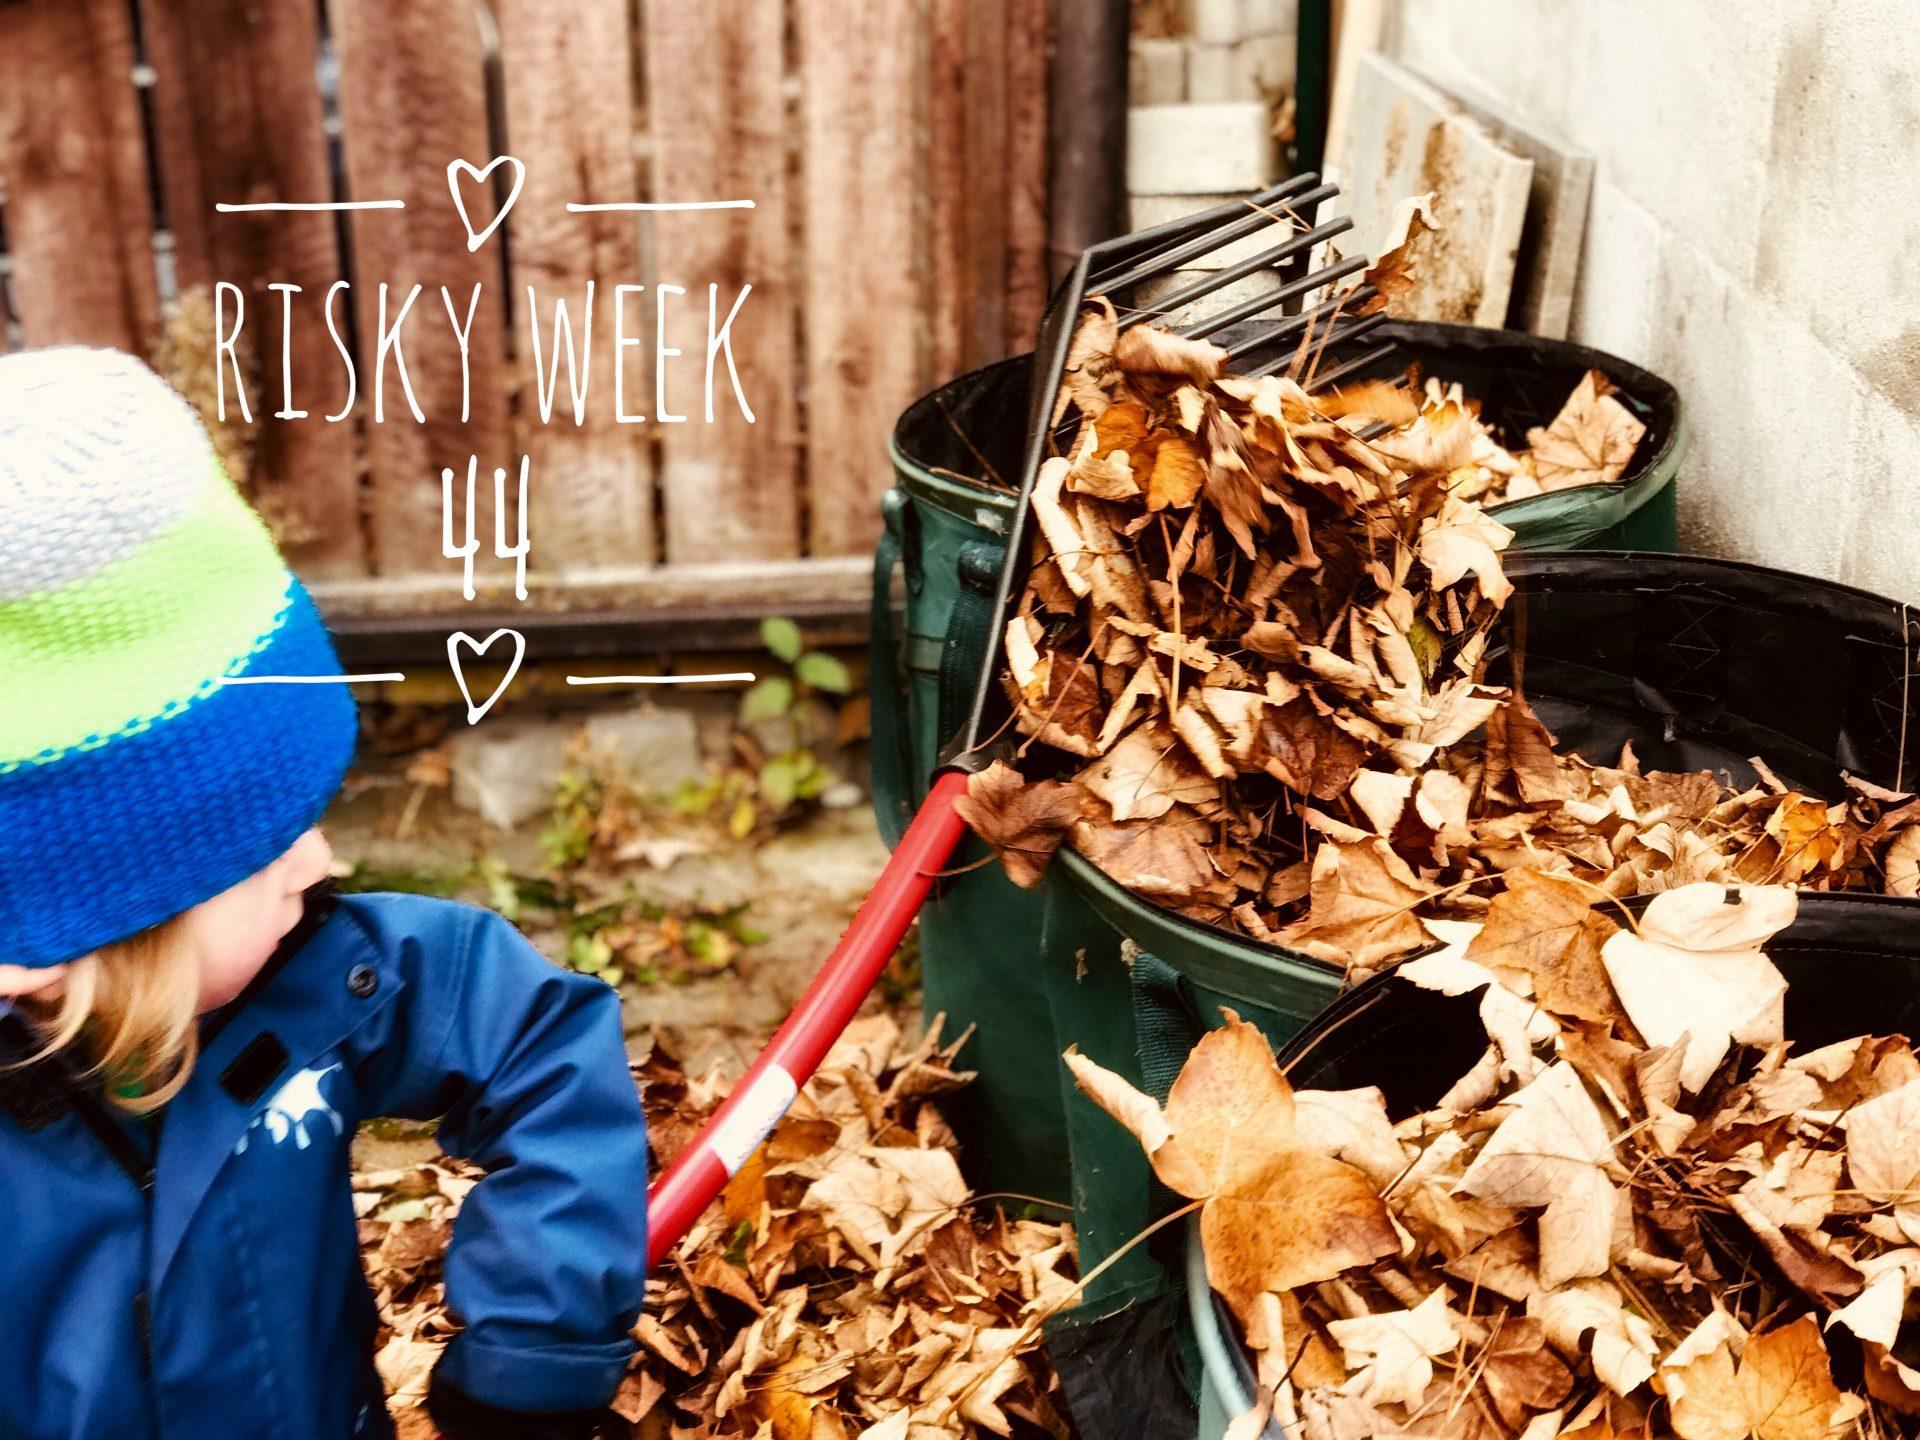 Risky Week 44 – Merlin bei der Gartenarbeit